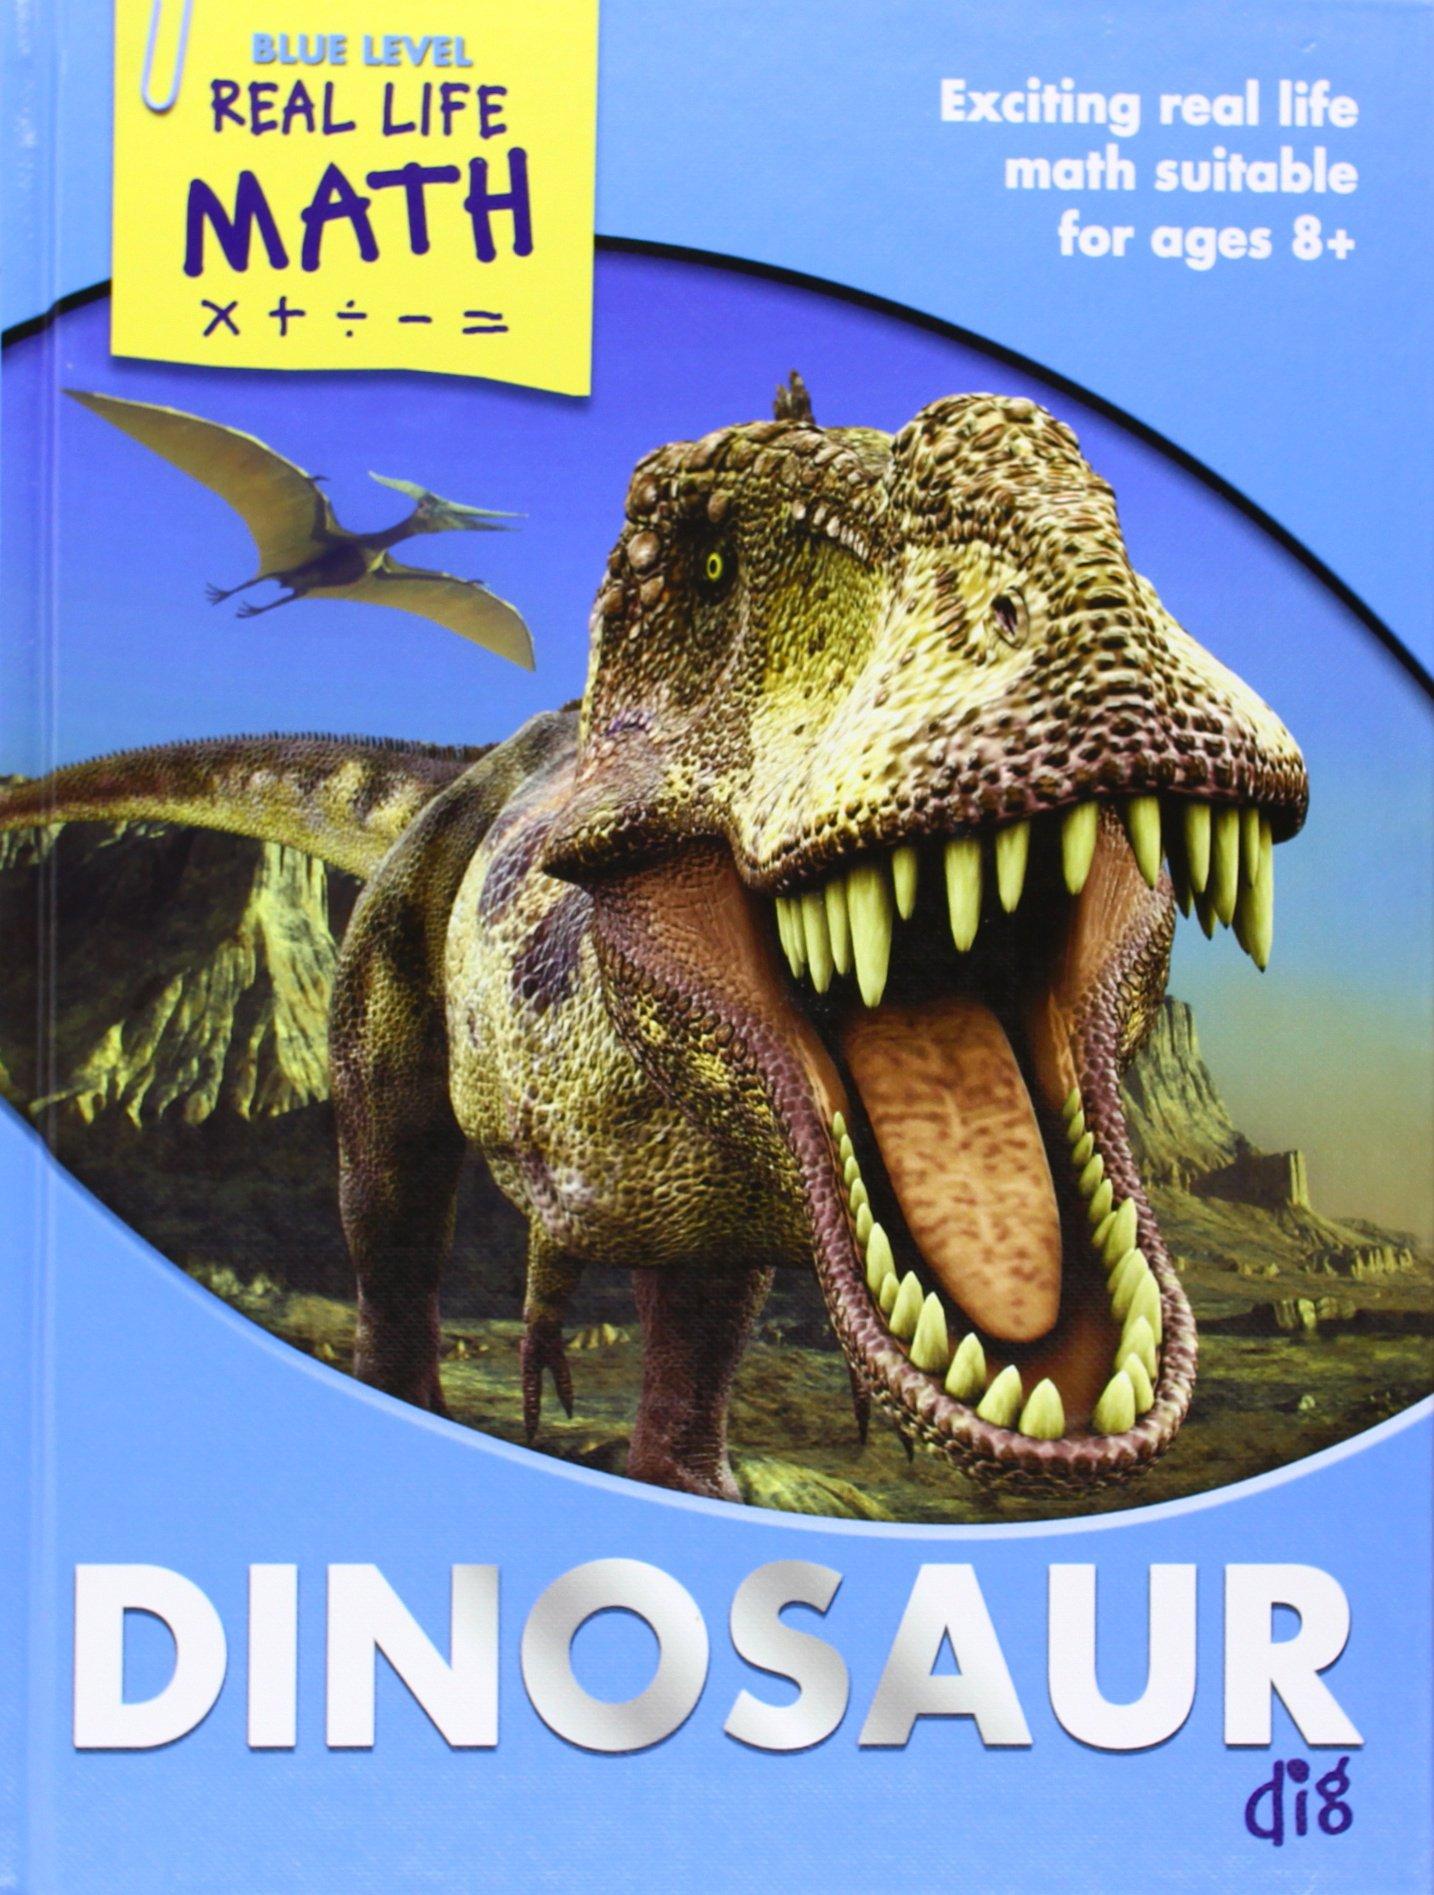 dinosaur-dig-real-life-math-blue-level